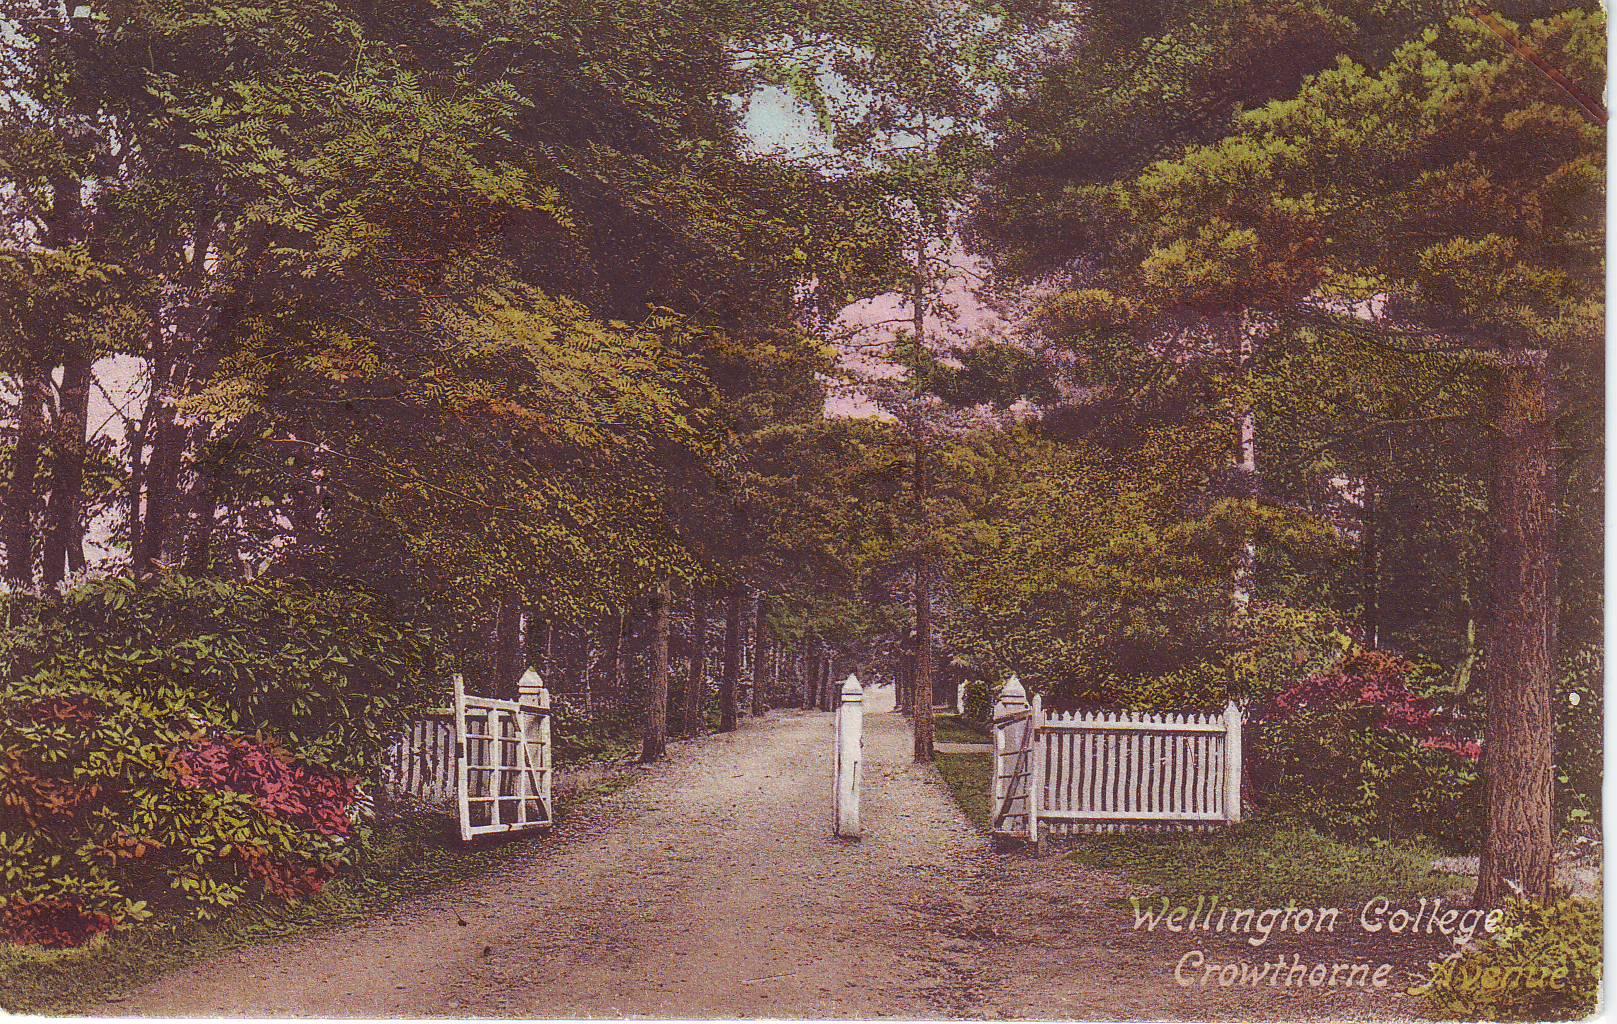 Wellington College, Crowthorne Avenue